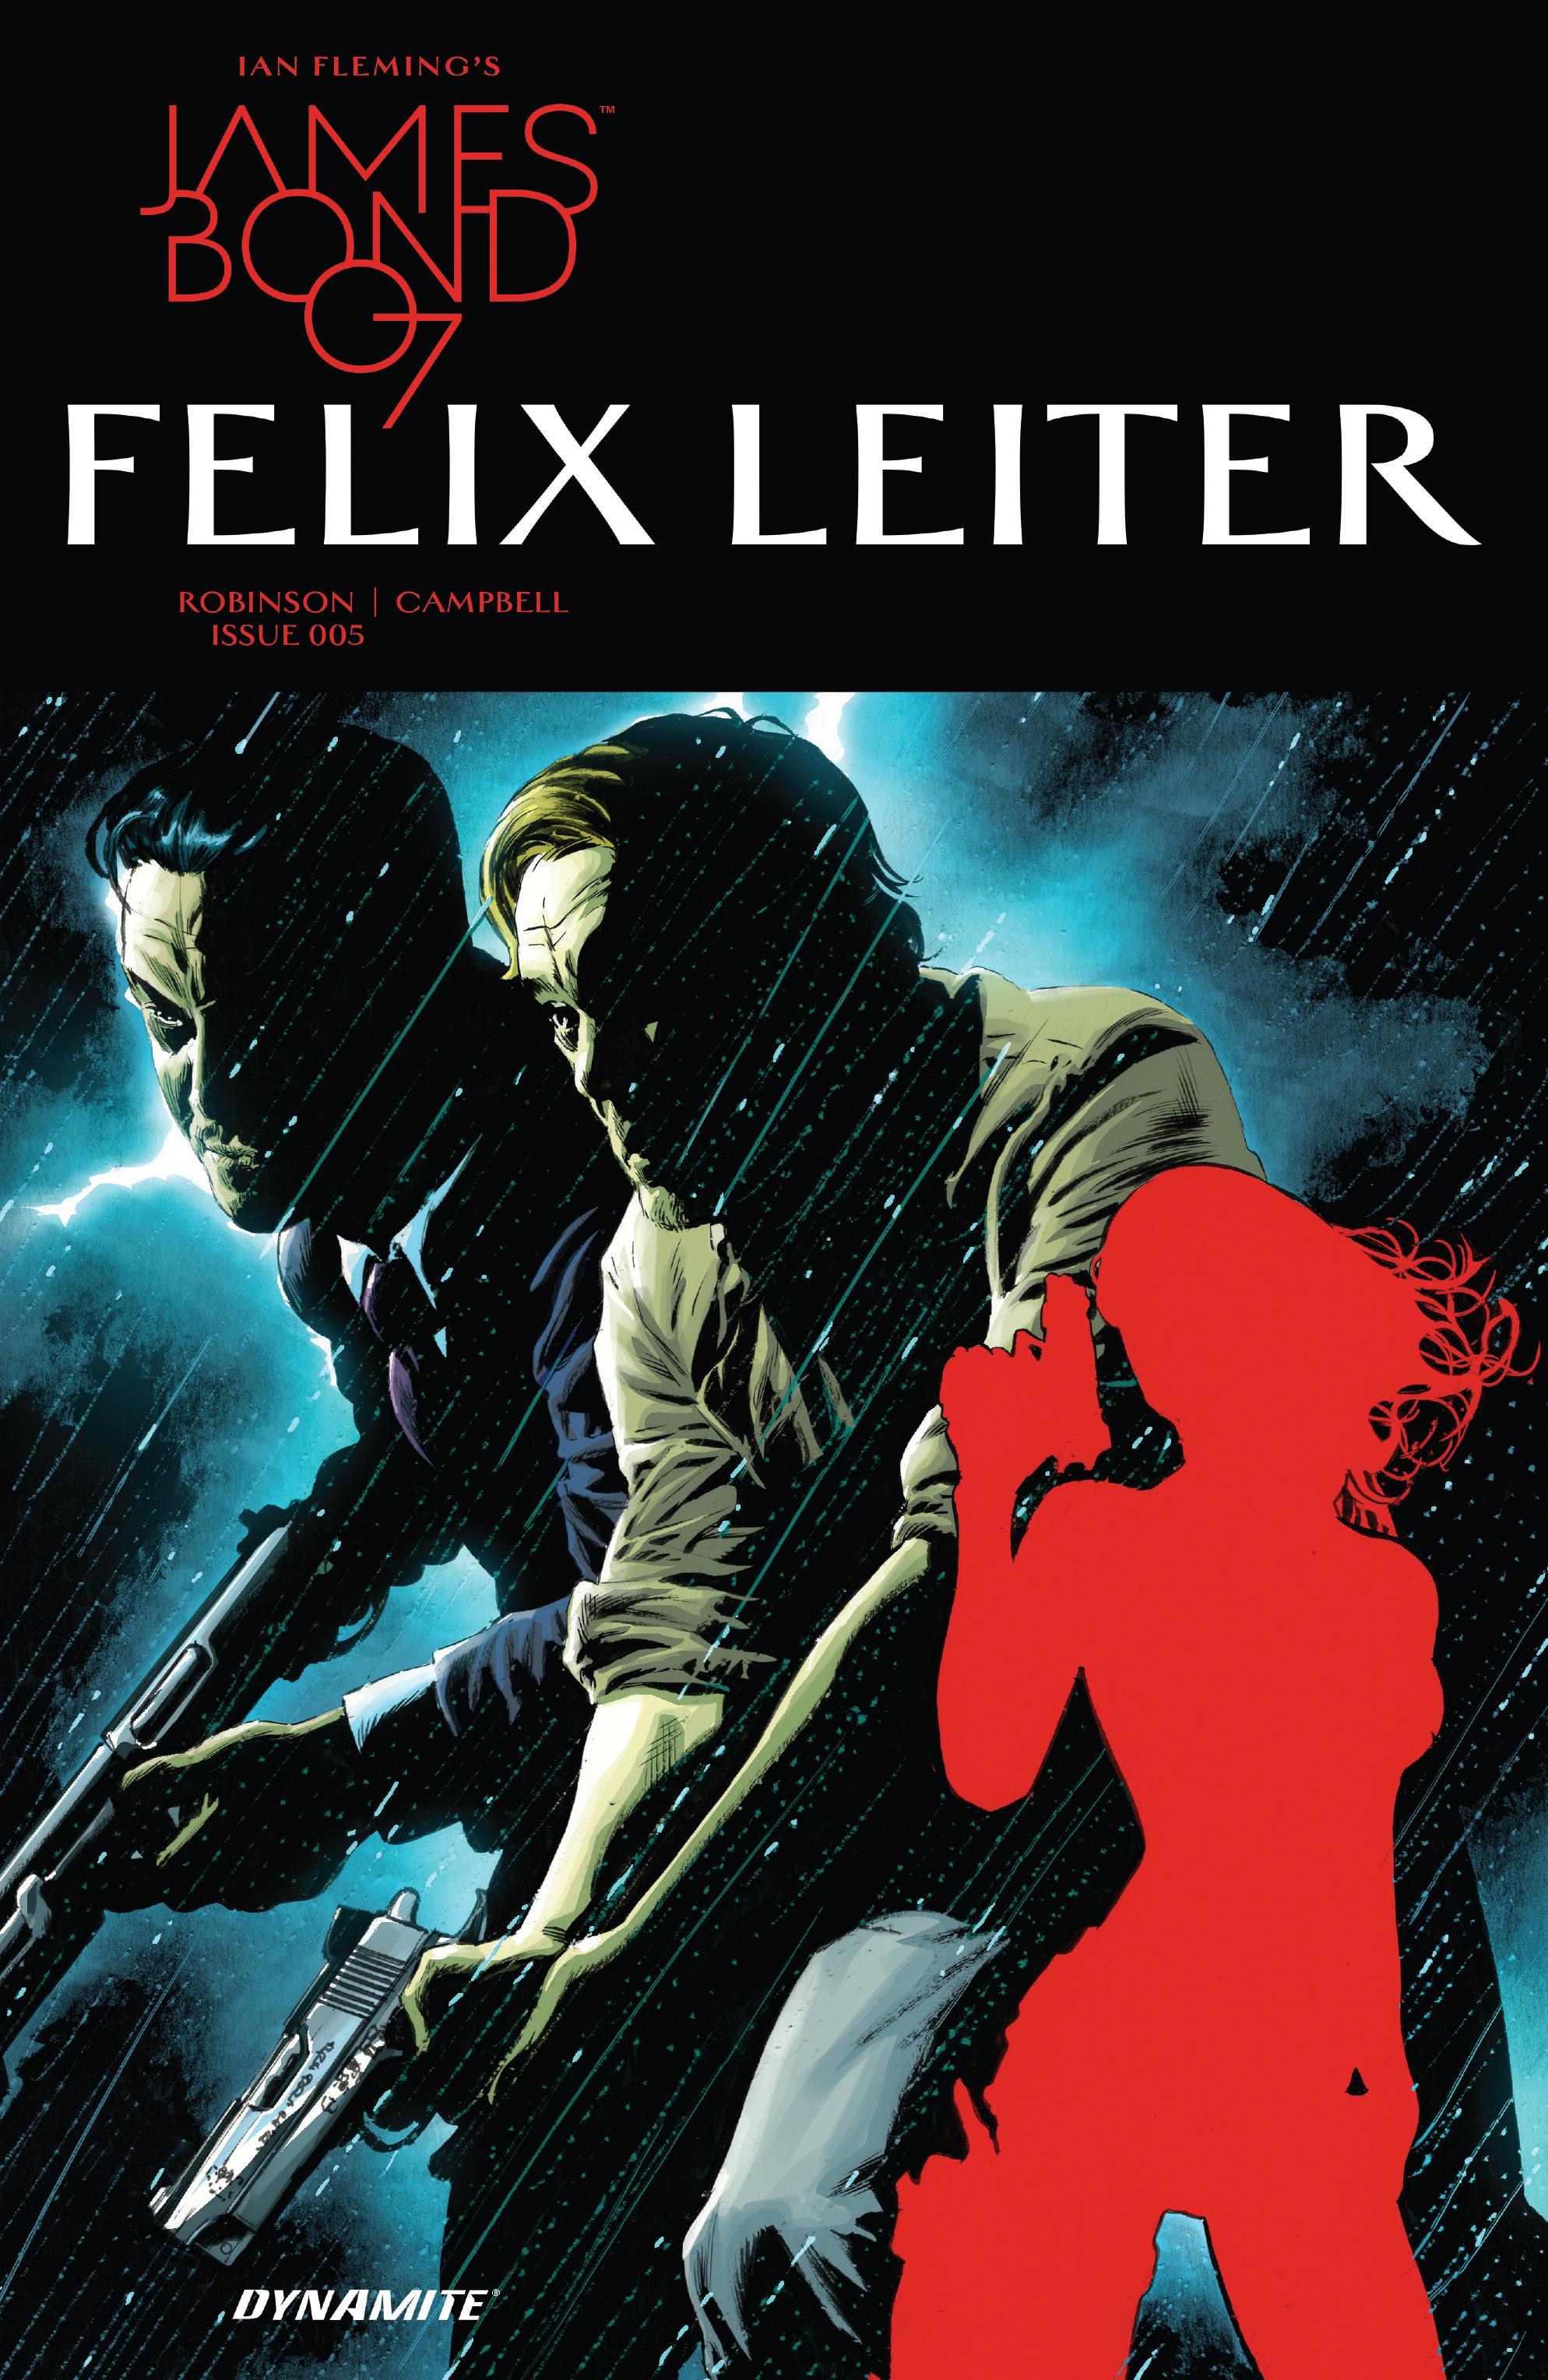 Read online James Bond: Felix Leiter comic -  Issue #5 - 1